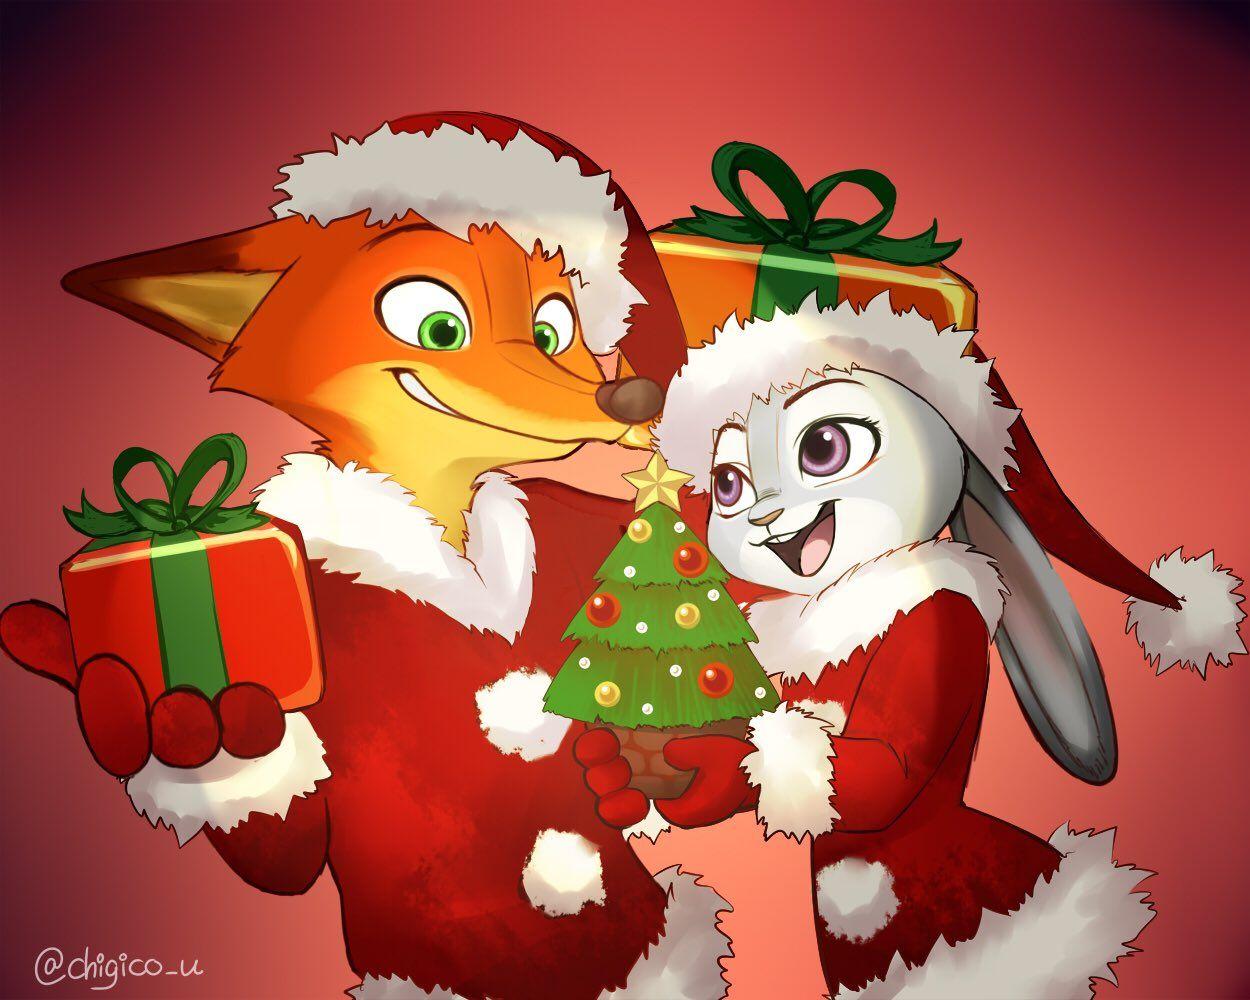 Nick and Judy!!